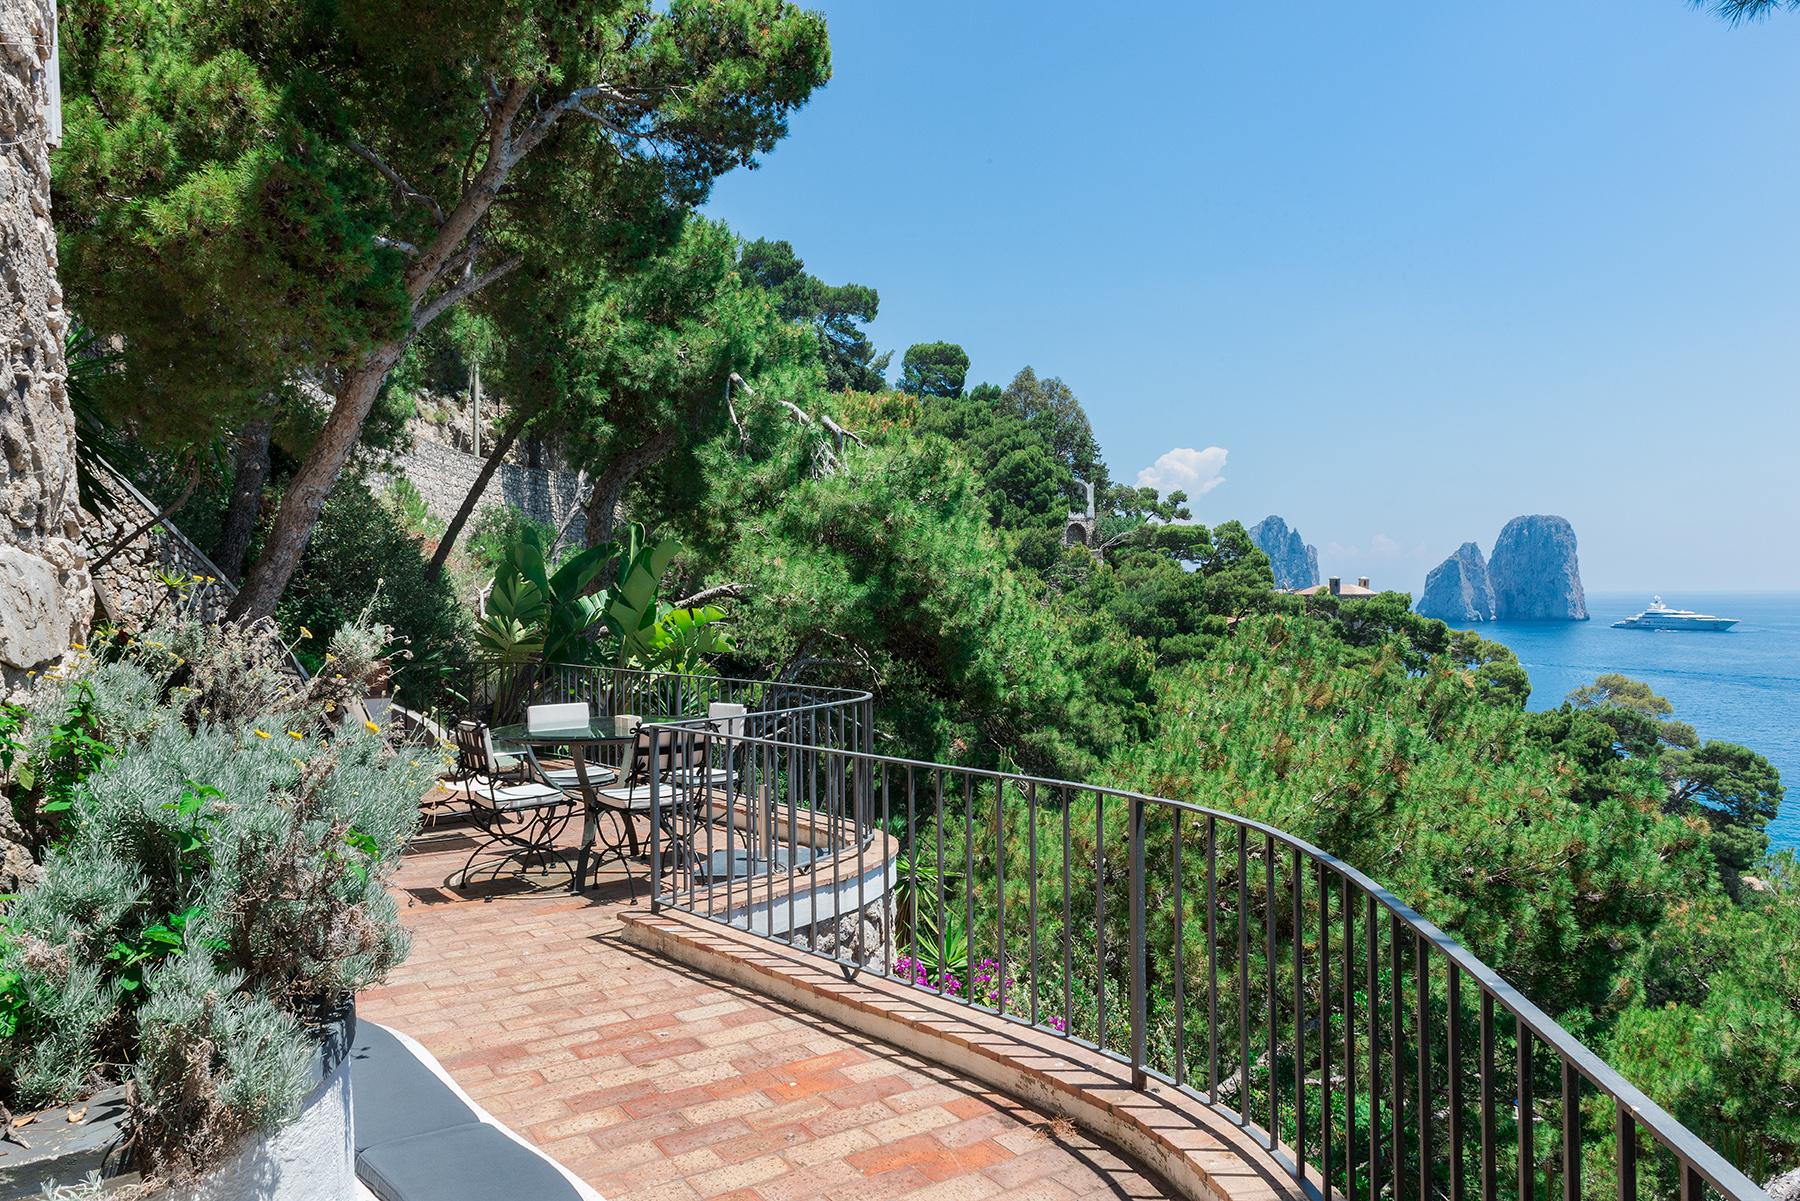 Villa Pieds dans l\'eau in Capri